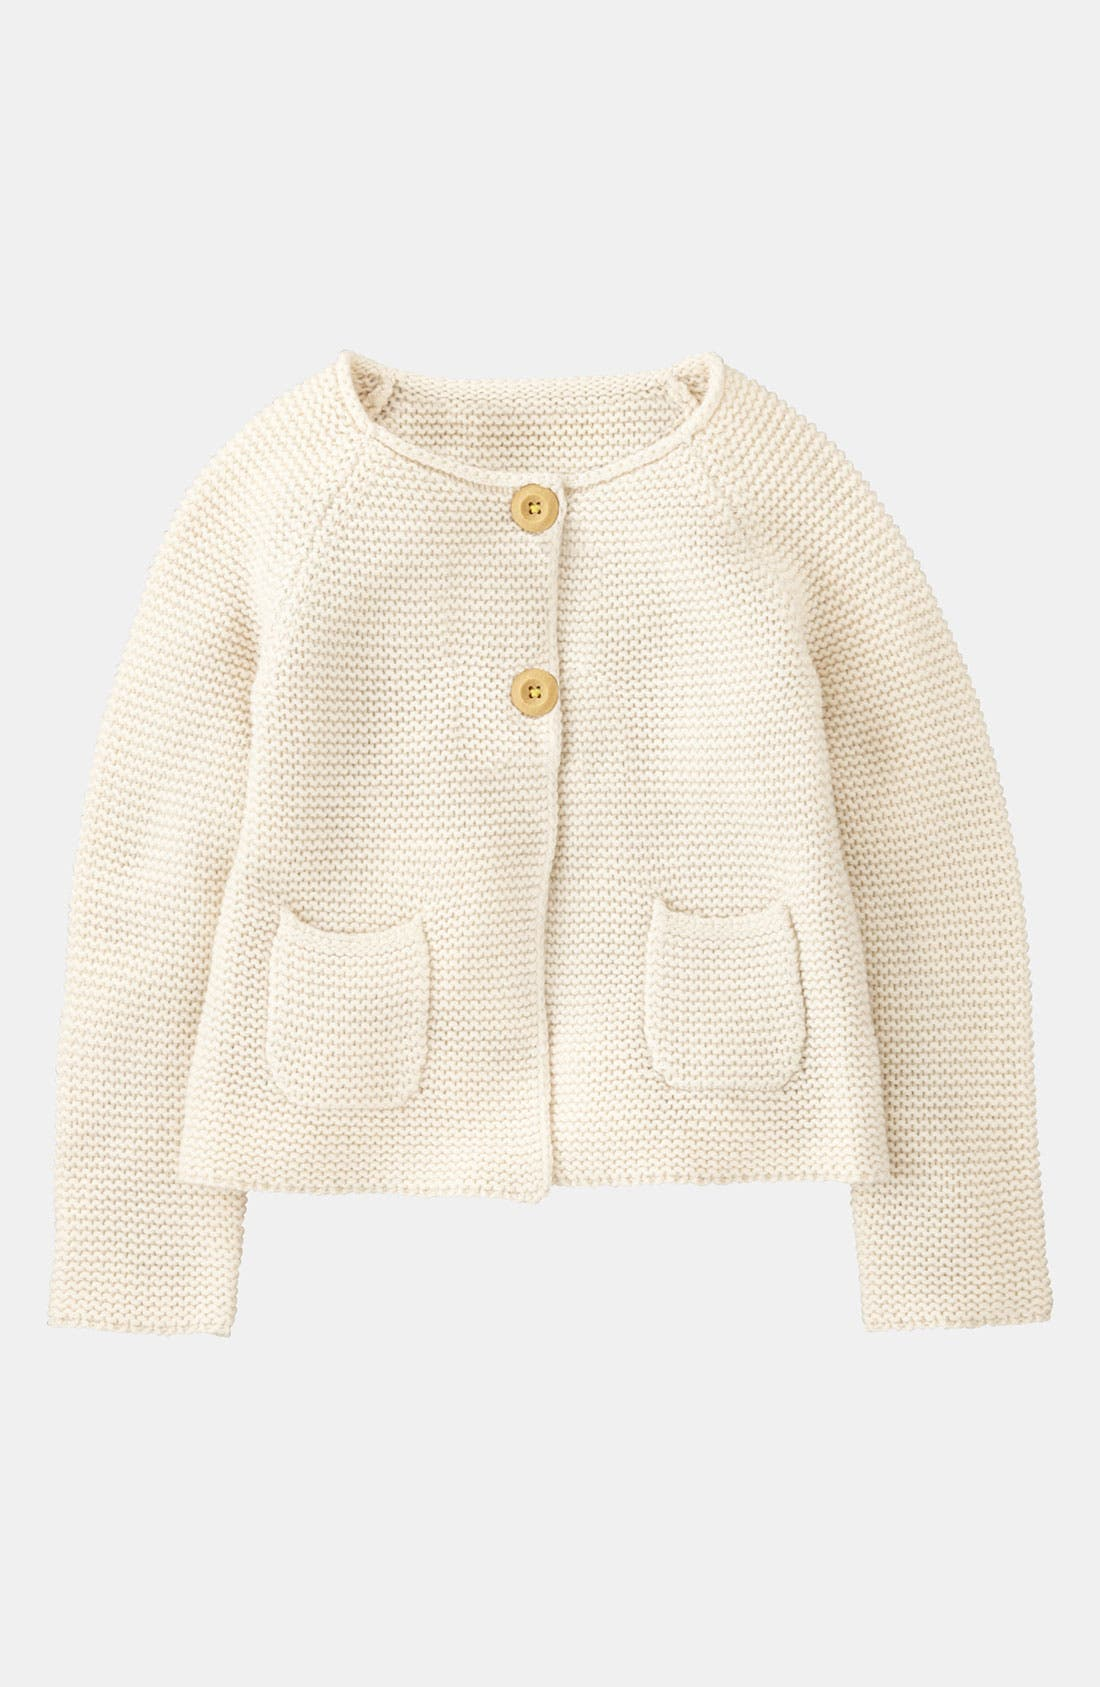 Main Image - Mini Boden Textured Cardigan (Toddler)